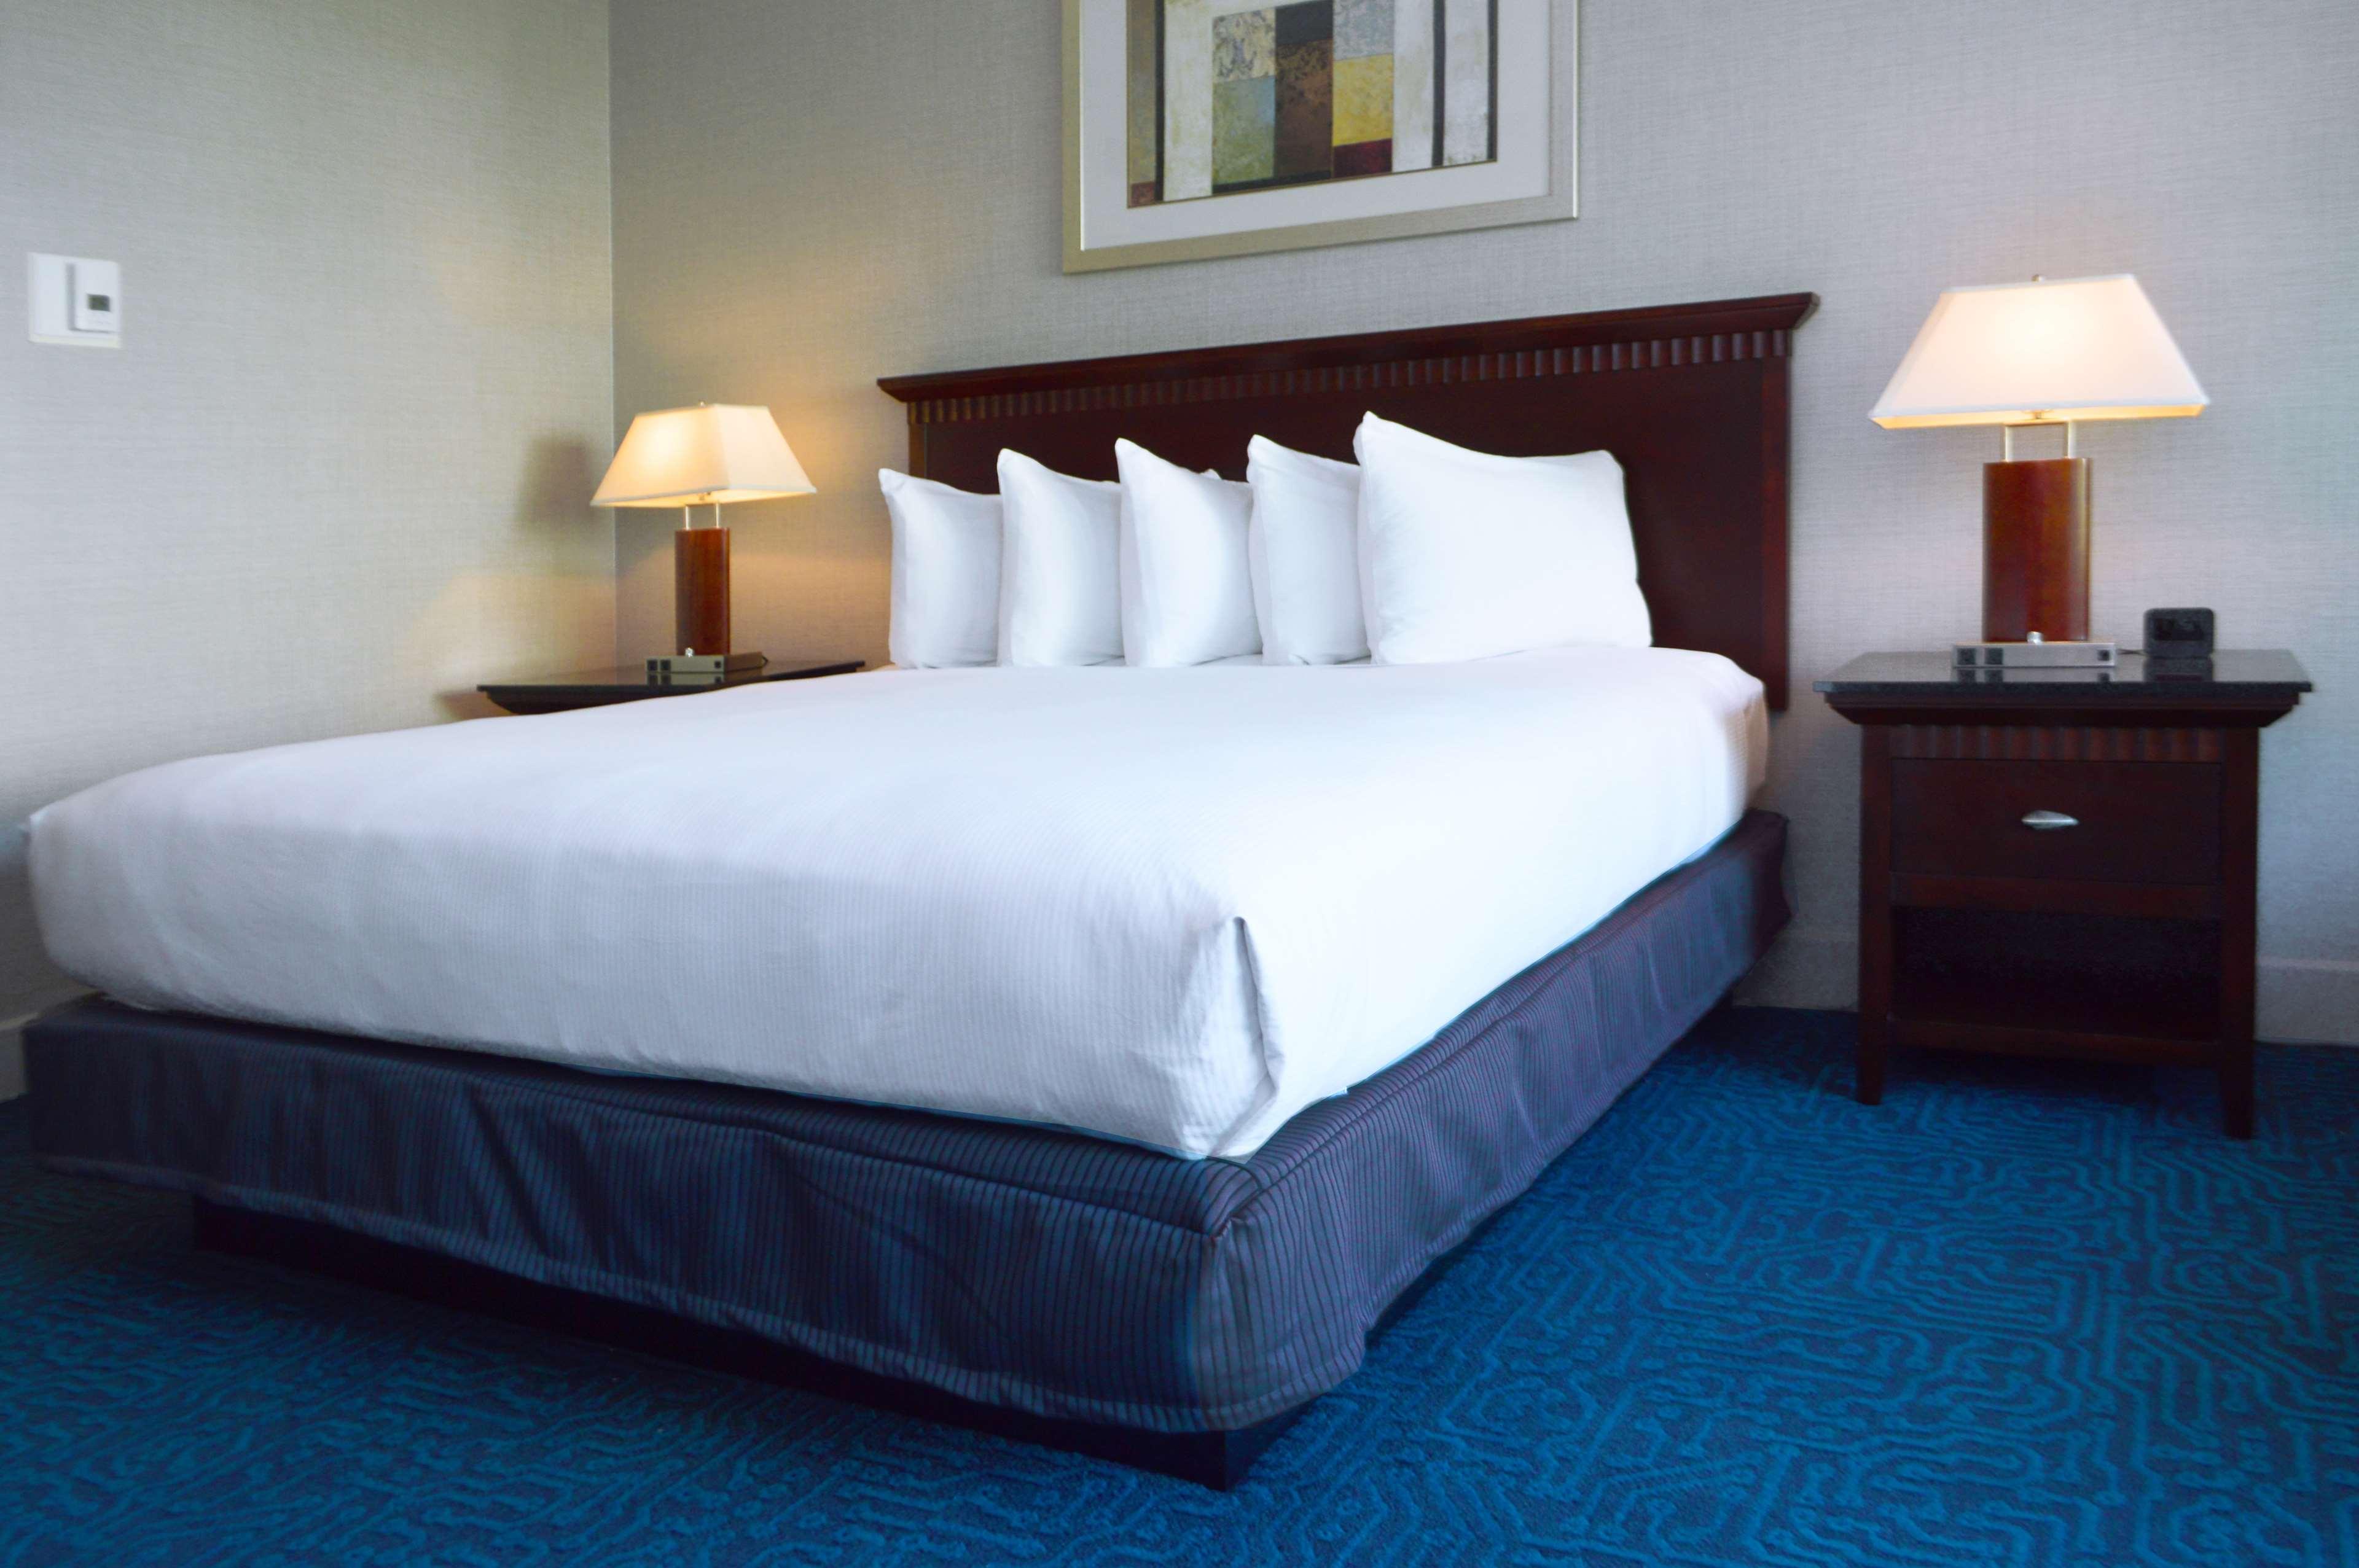 DoubleTree by Hilton Hotel Newark - Fremont image 35